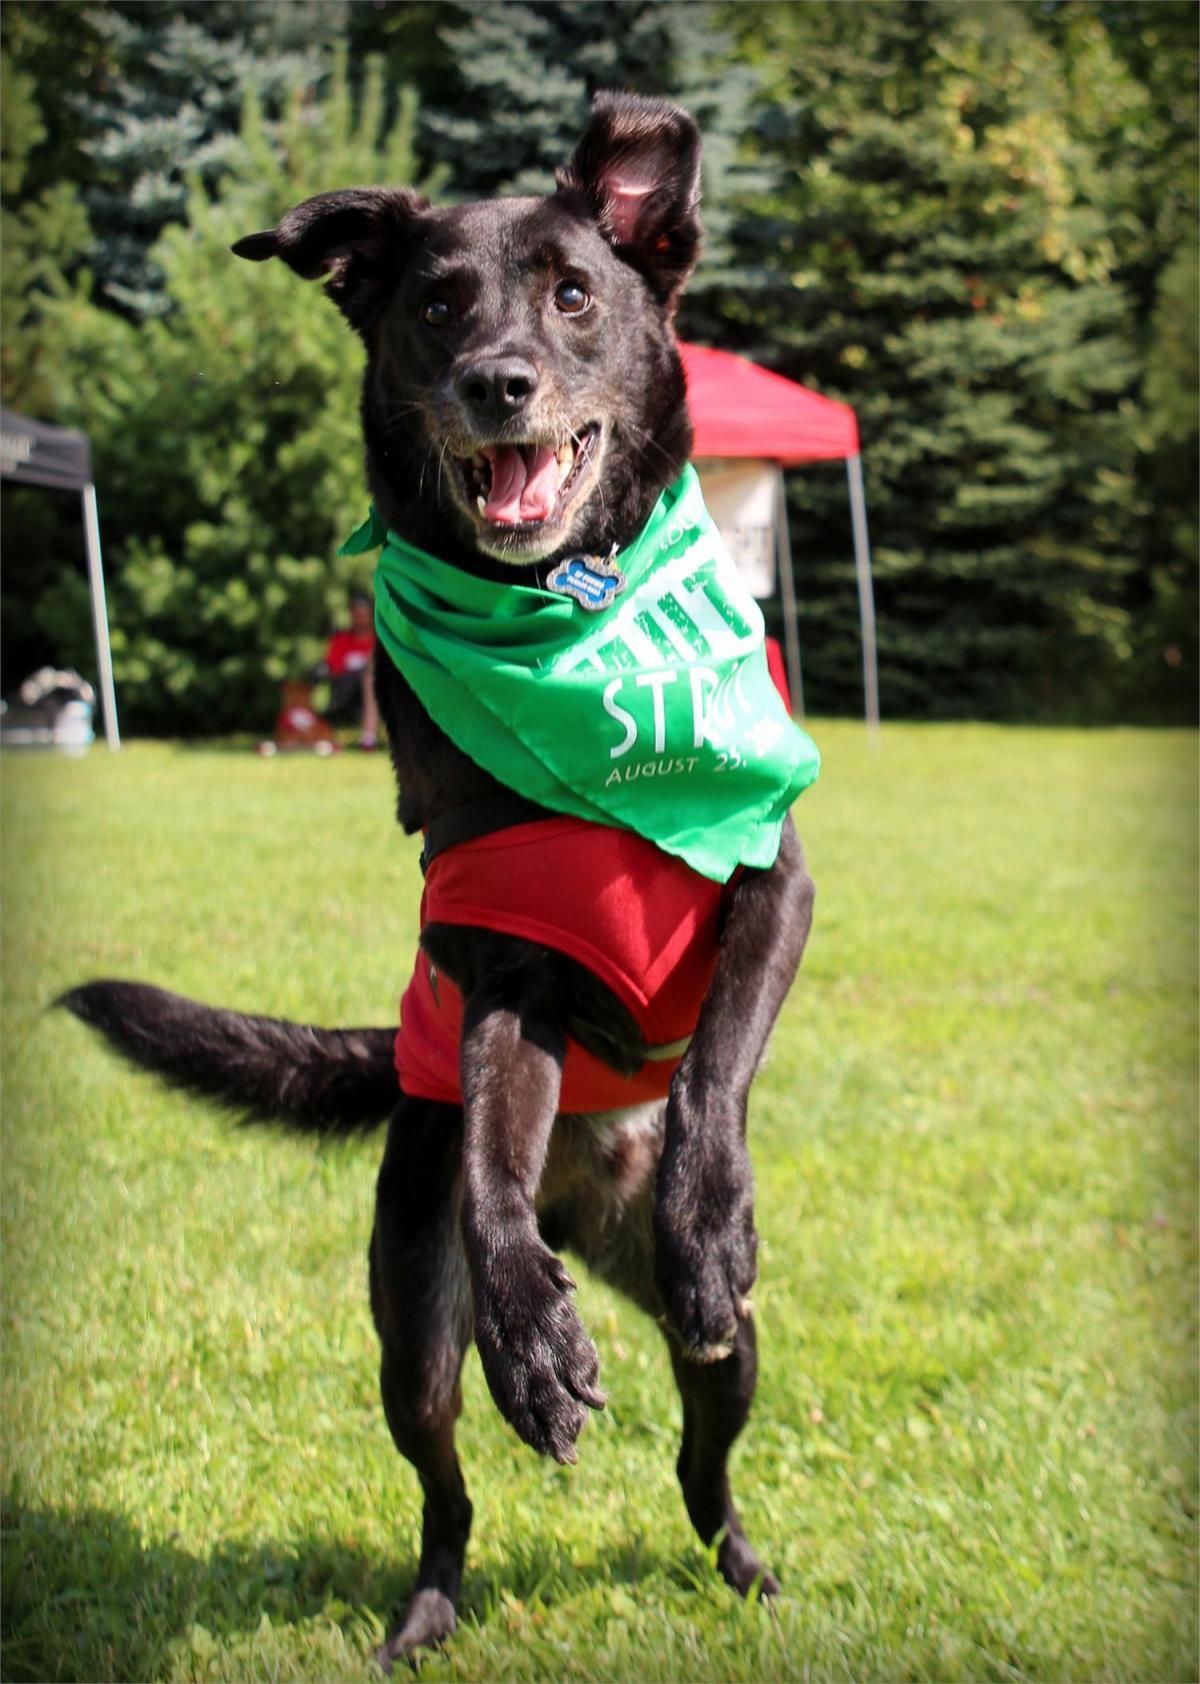 August Dog FriendlyEvents